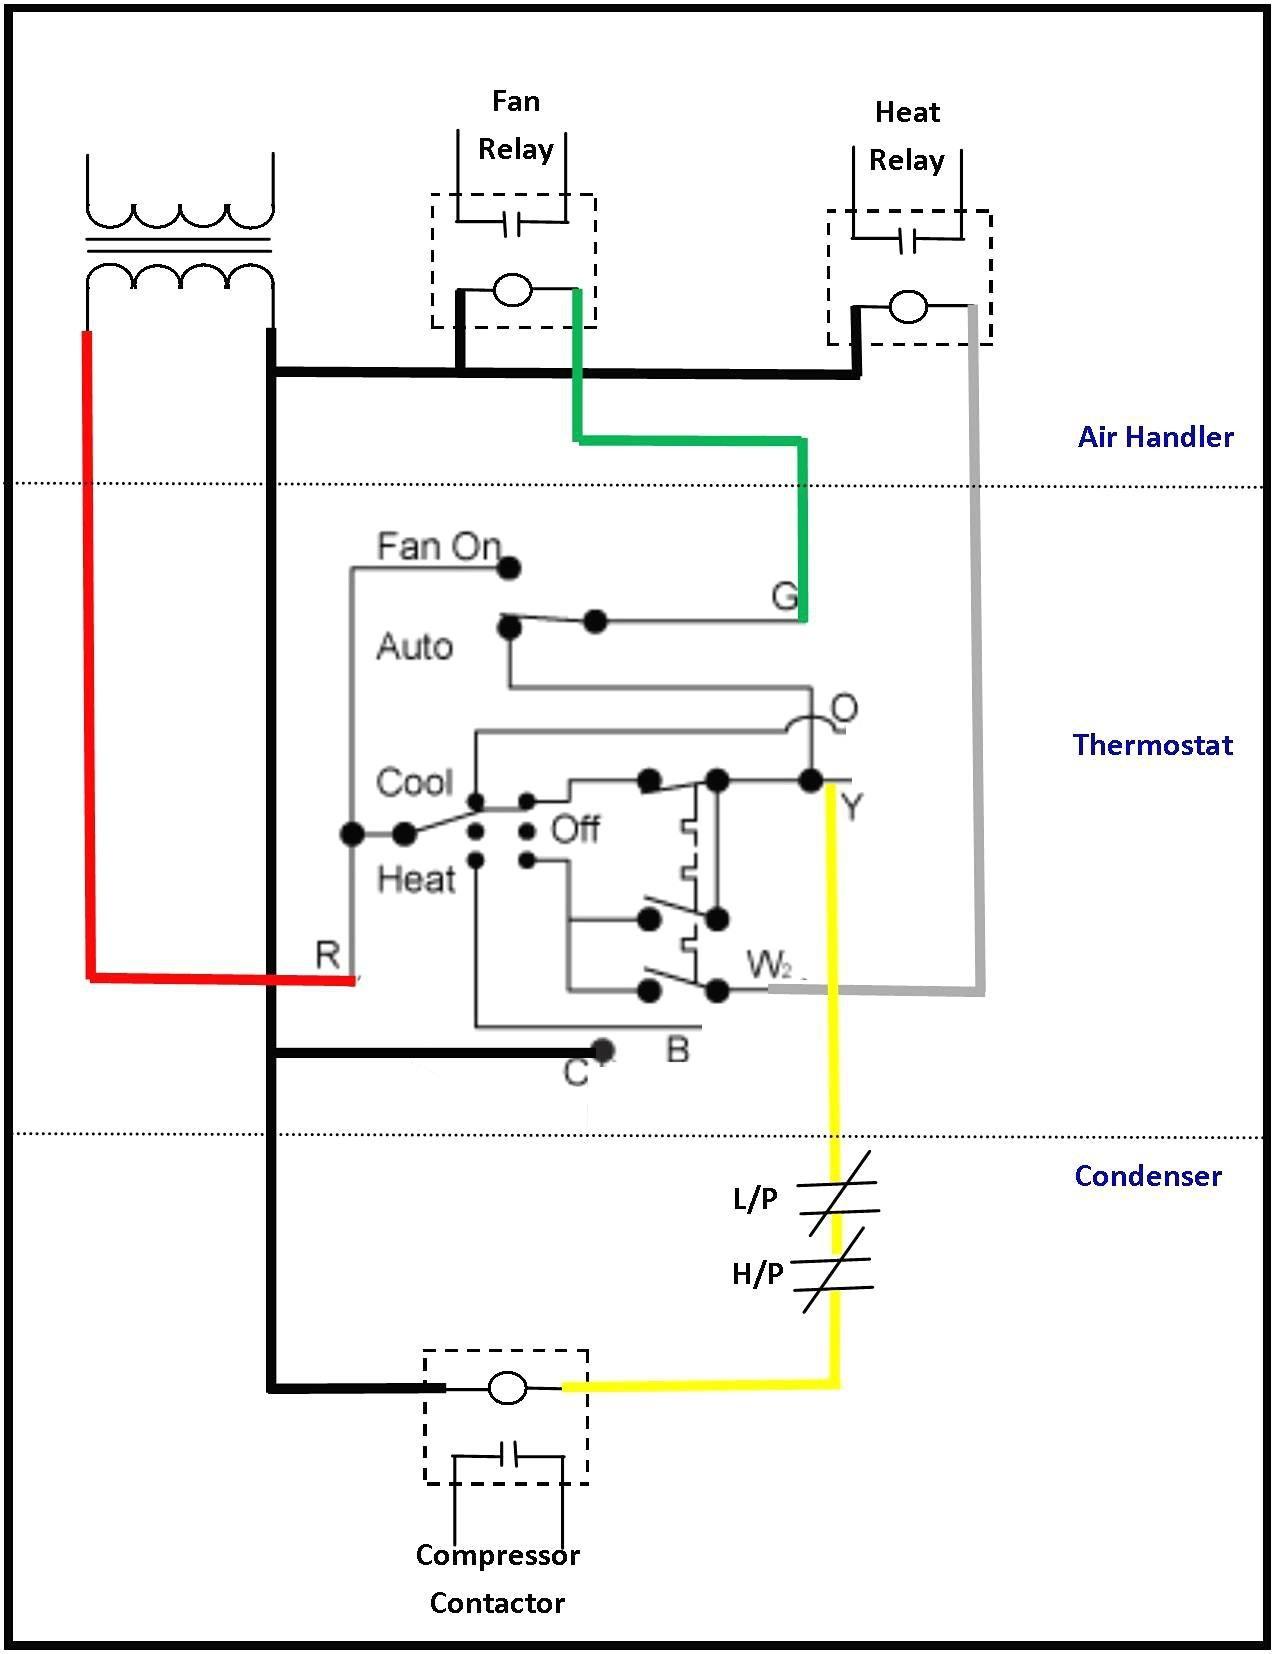 Goodman Air Handler Wiring Diagram Fresh Wiring Diagram for Goodman Air Handler A36 10 Goodman Heat